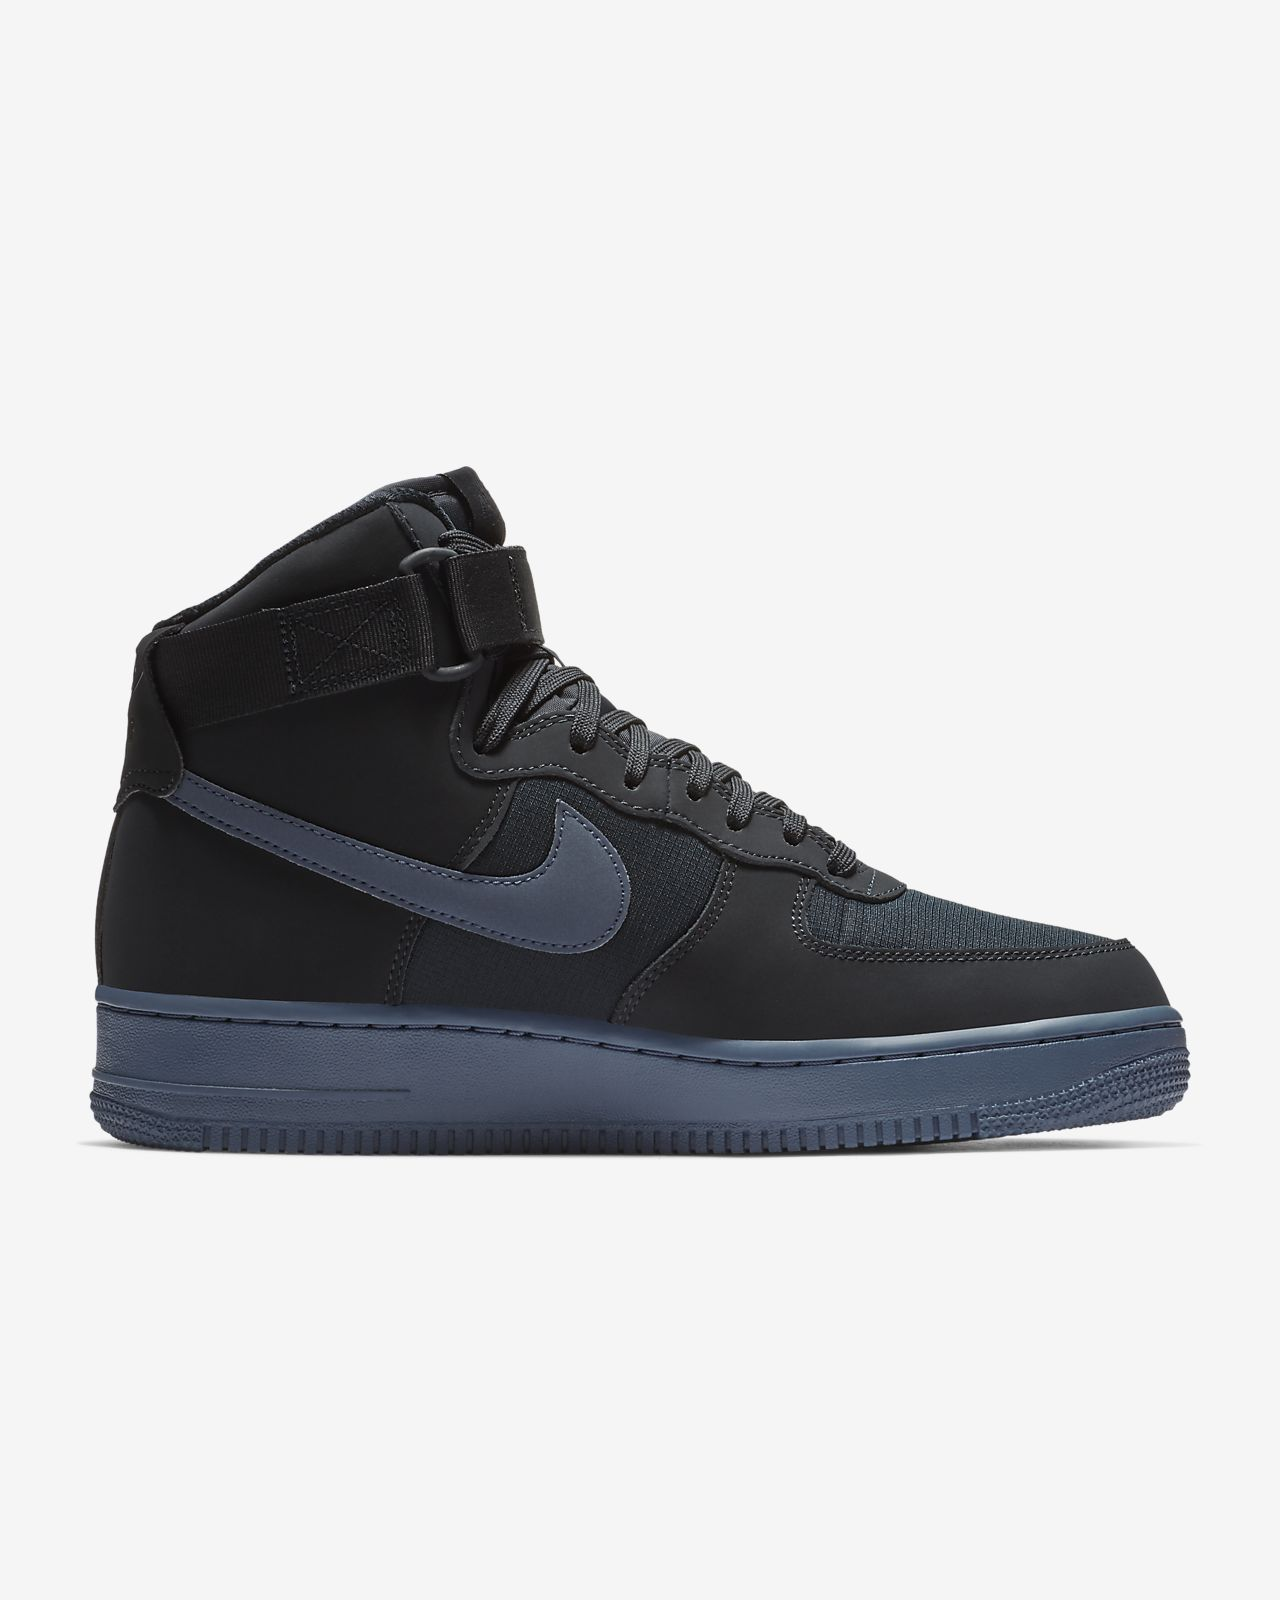 40f612834f6c18 Nike Air Force 1 High 07 Men s Shoe. Nike.com